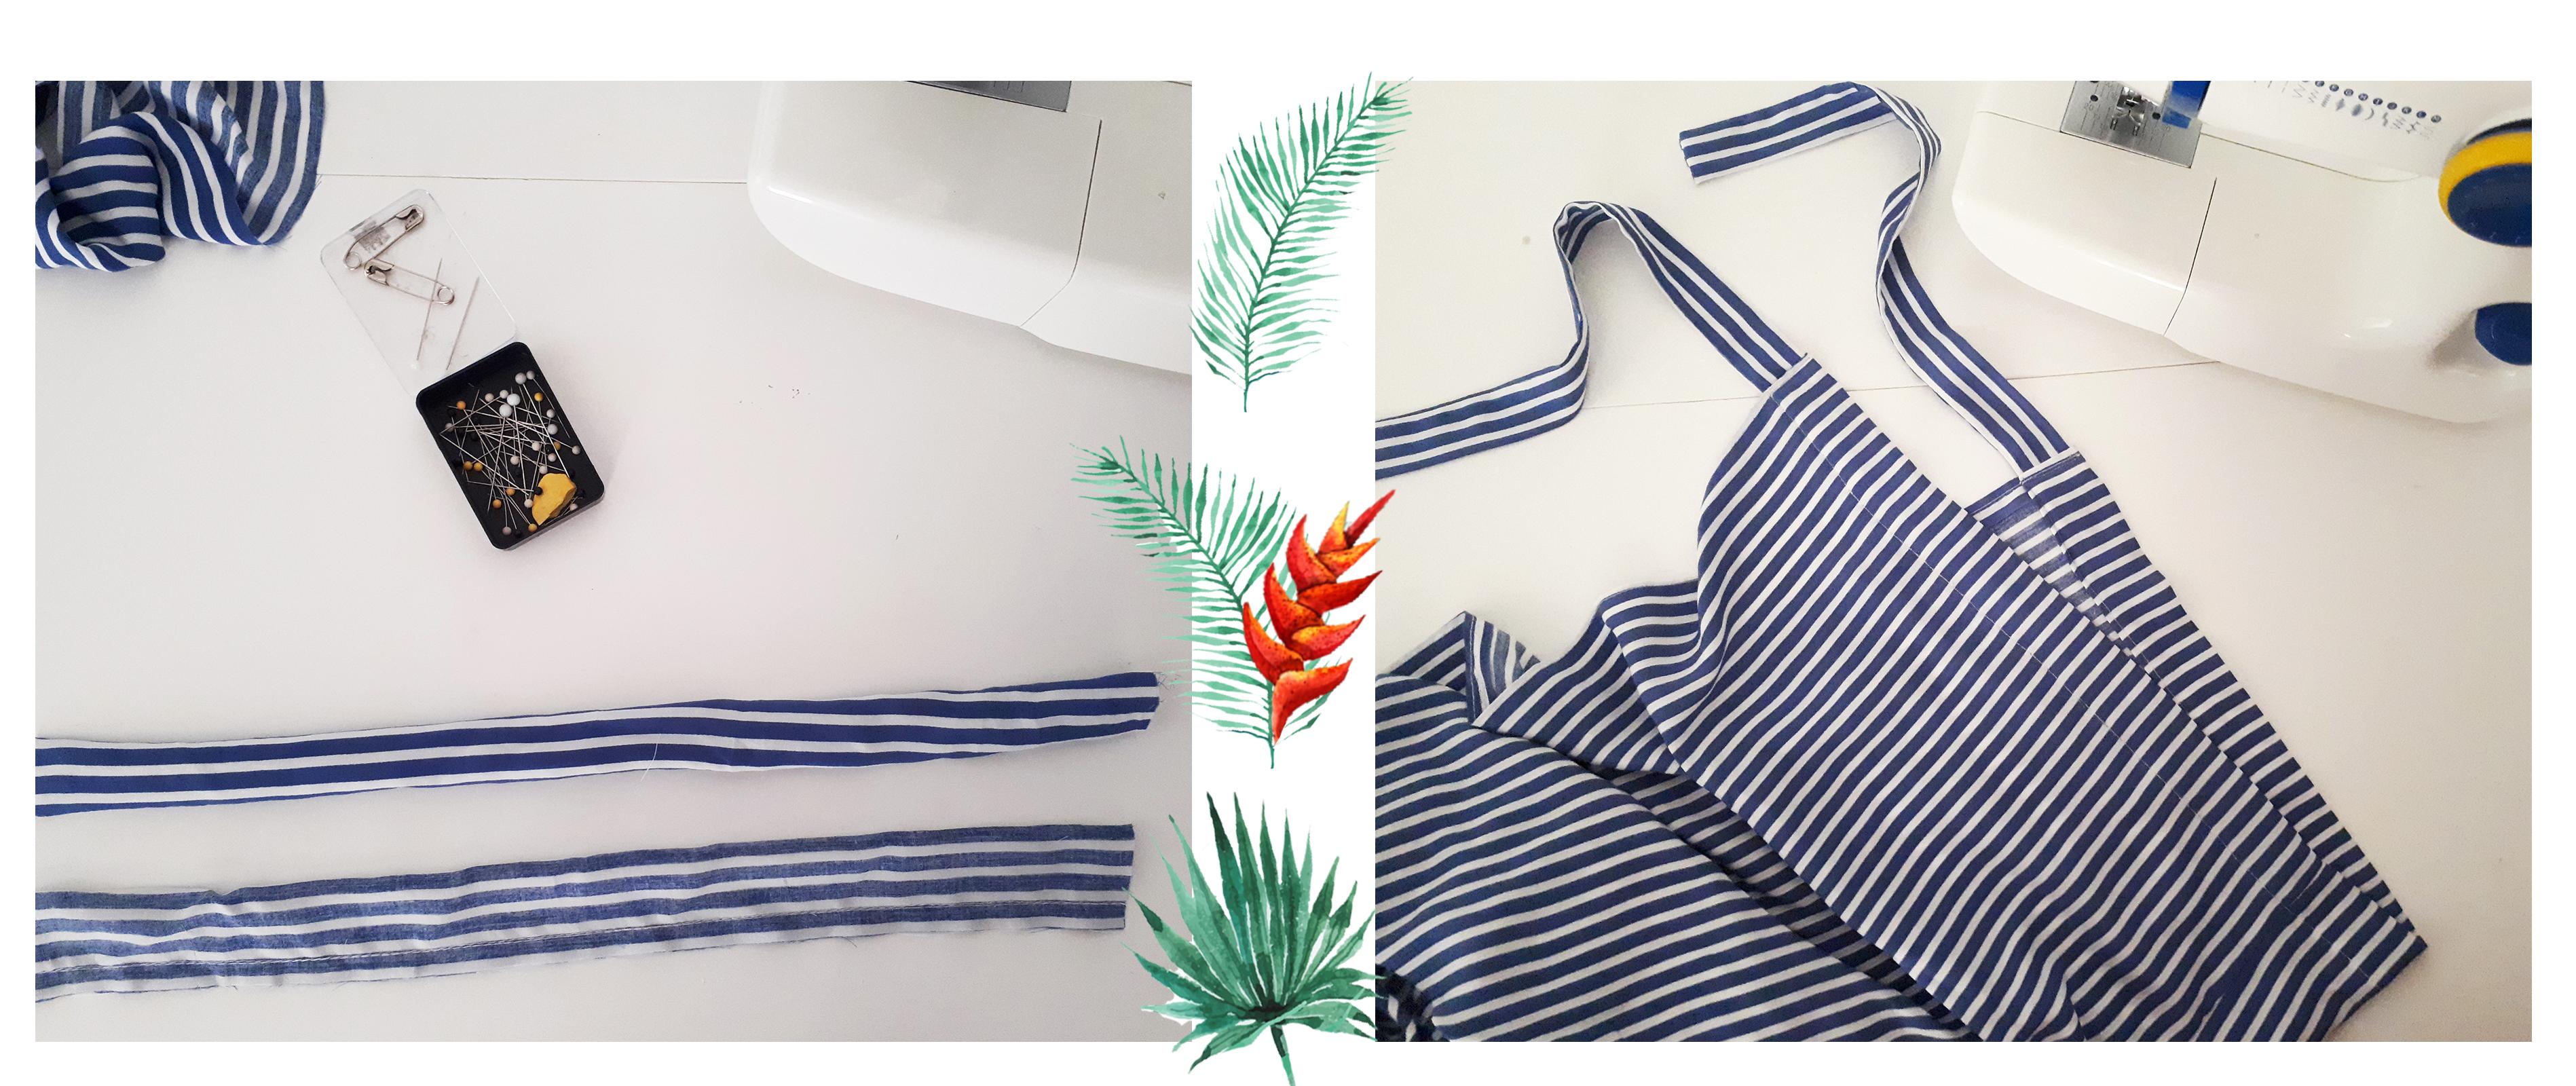 DIY-Pantalon-portefeuille-etape-7-8-Cactus-and-Style